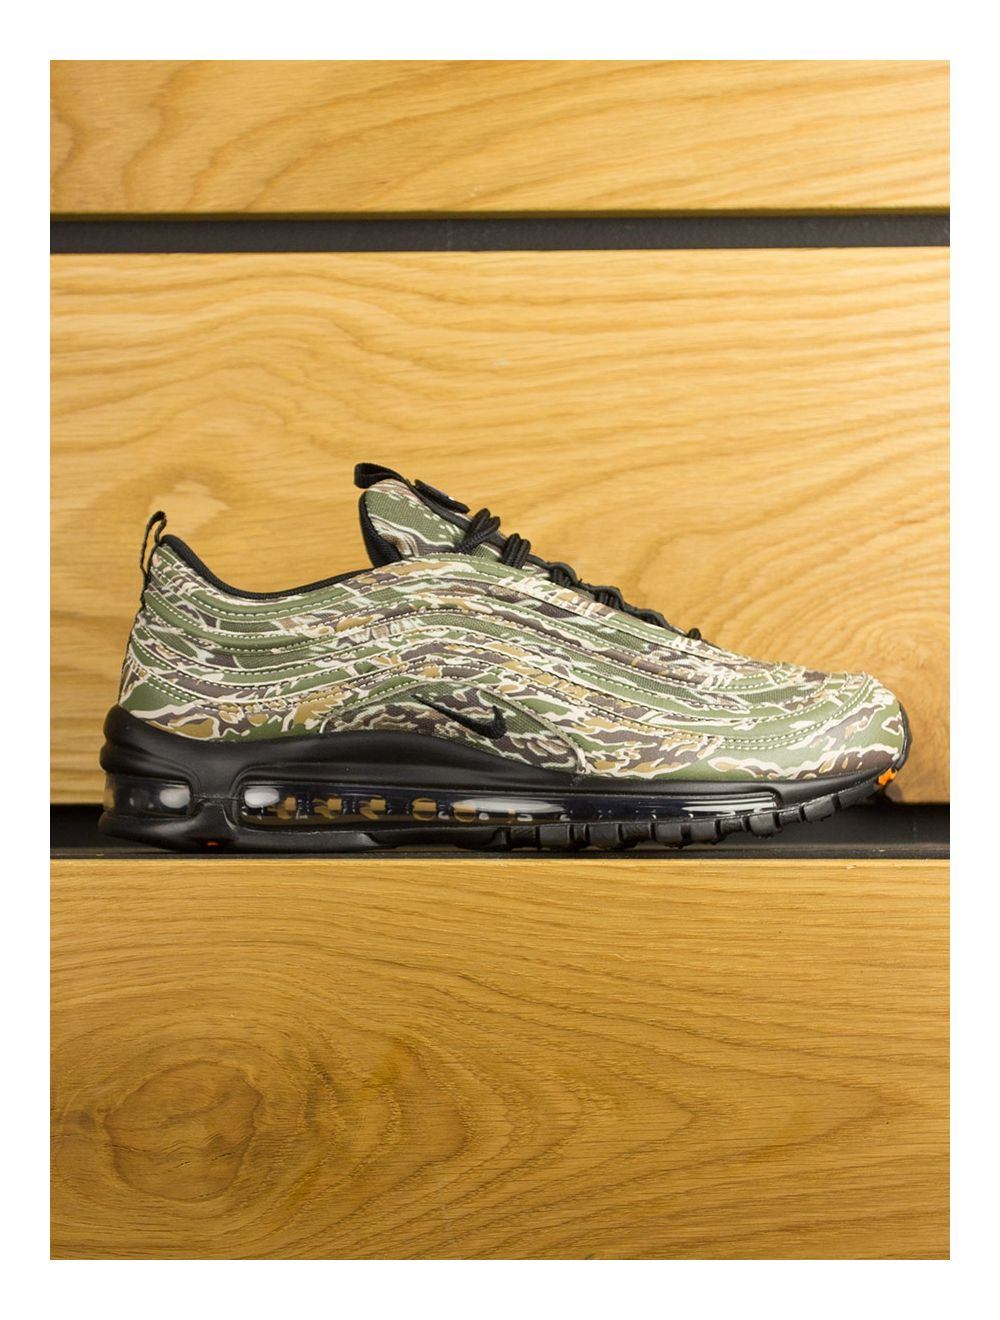 size 40 a7c5b 62211 Nike Air Max 97 Premium QS 'Country Camo USA' - Medium Olive Black Desert  Sand